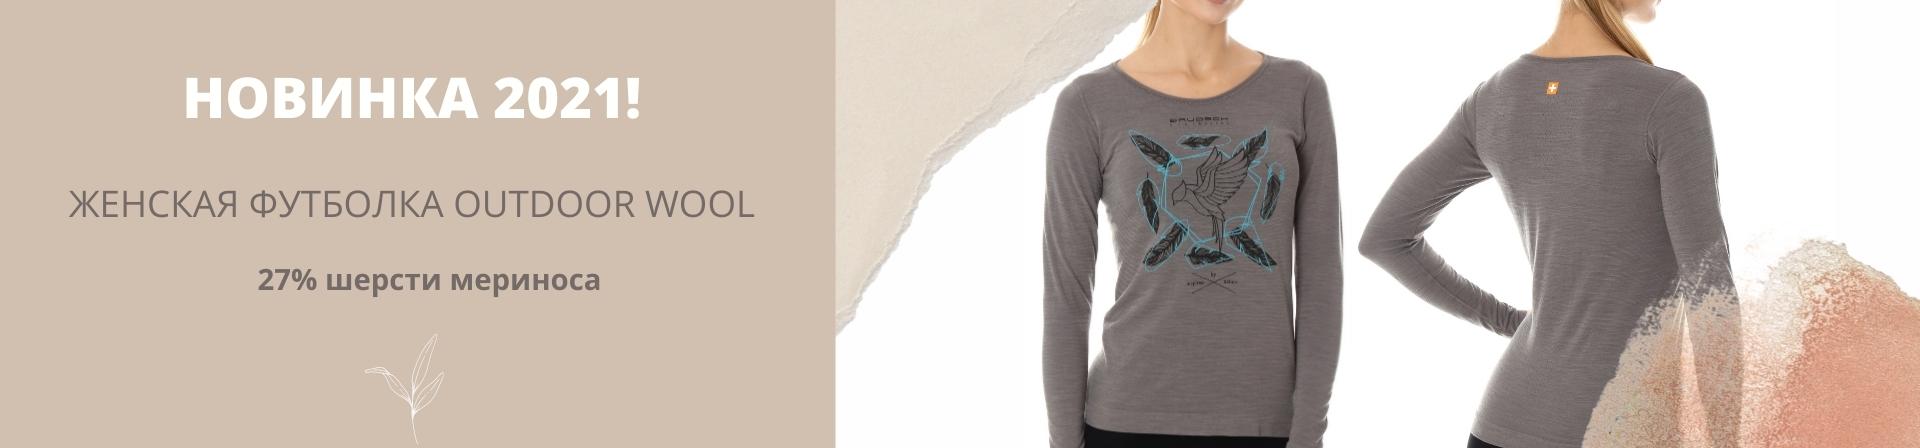 Футболка женская Outdoor Wool Птица - Новинка 2021!